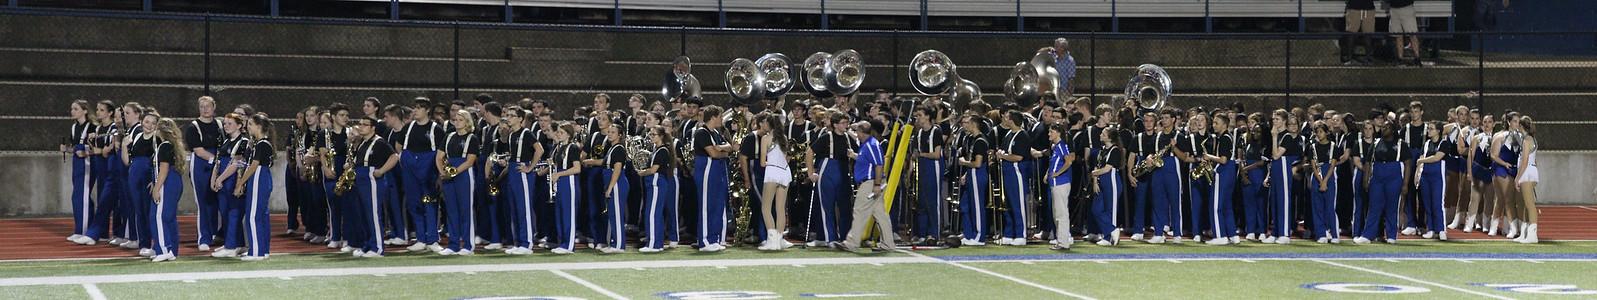 2016-17 - LHS Band